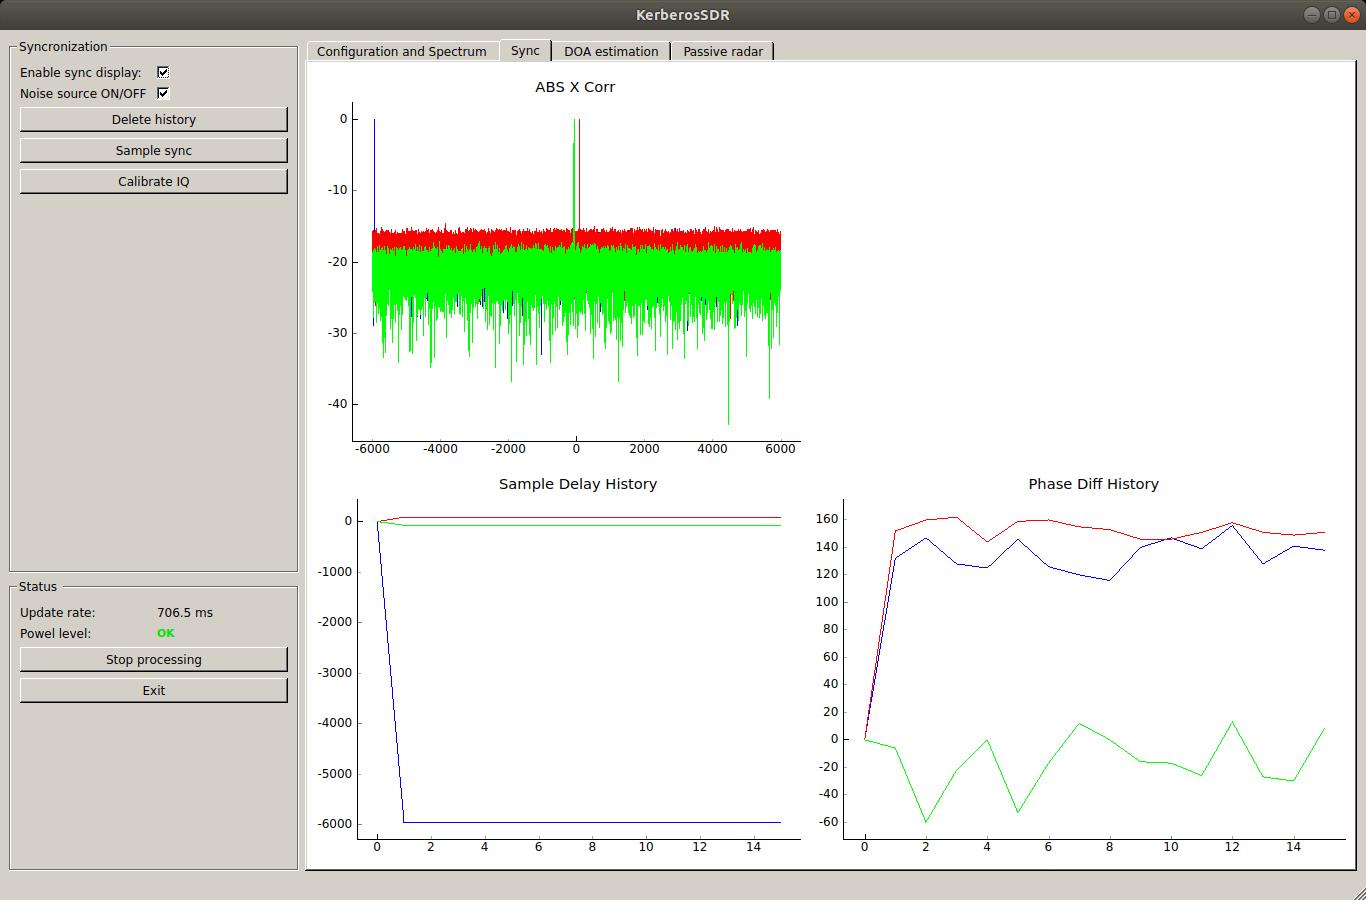 Unsynced KerberosSDR Graphs